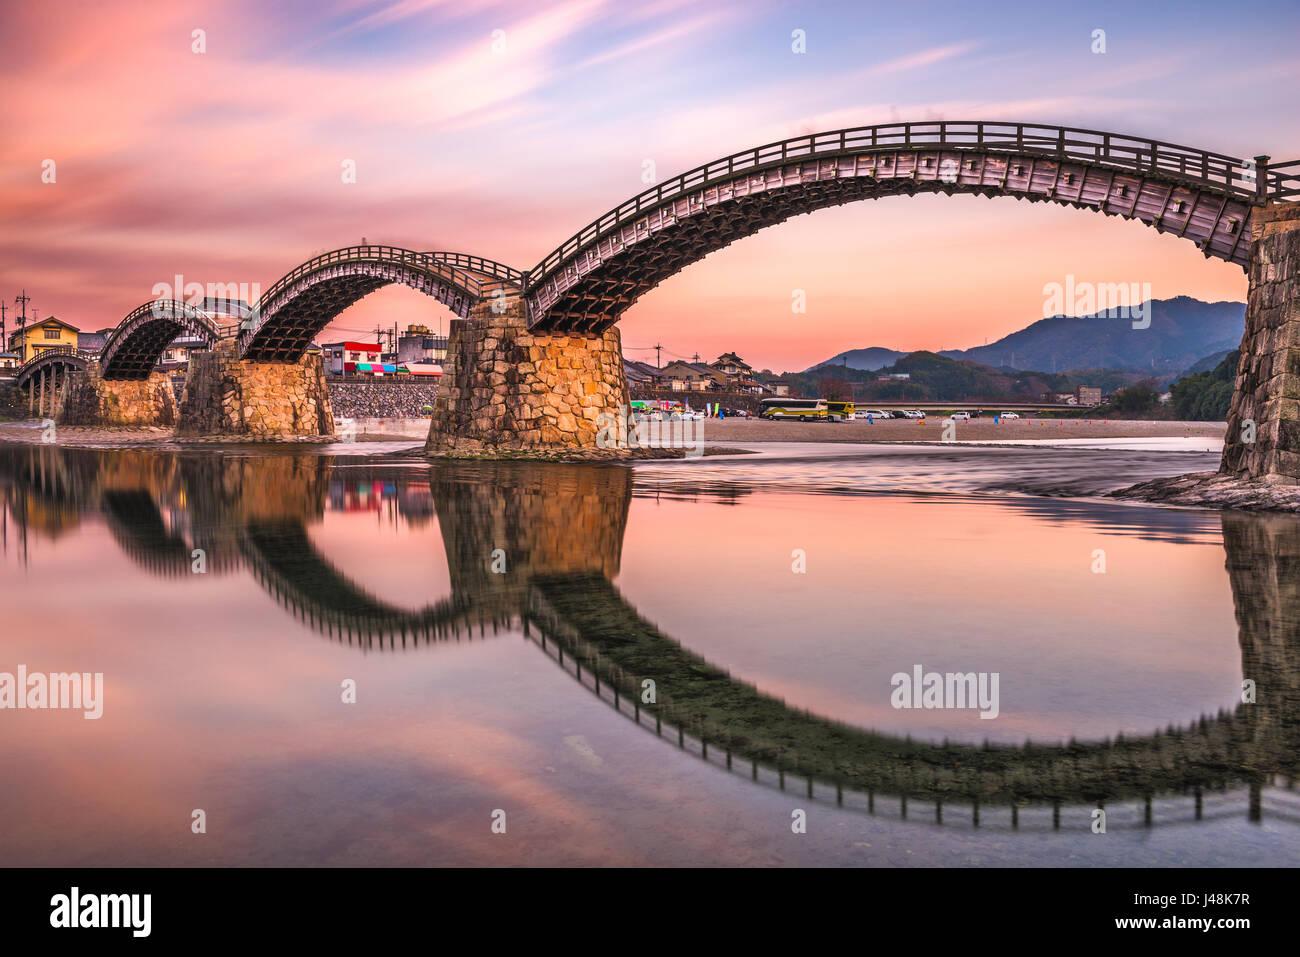 Iwakuni, Hiroshima, Giappone a ponte Kintaikyo al crepuscolo. Immagini Stock